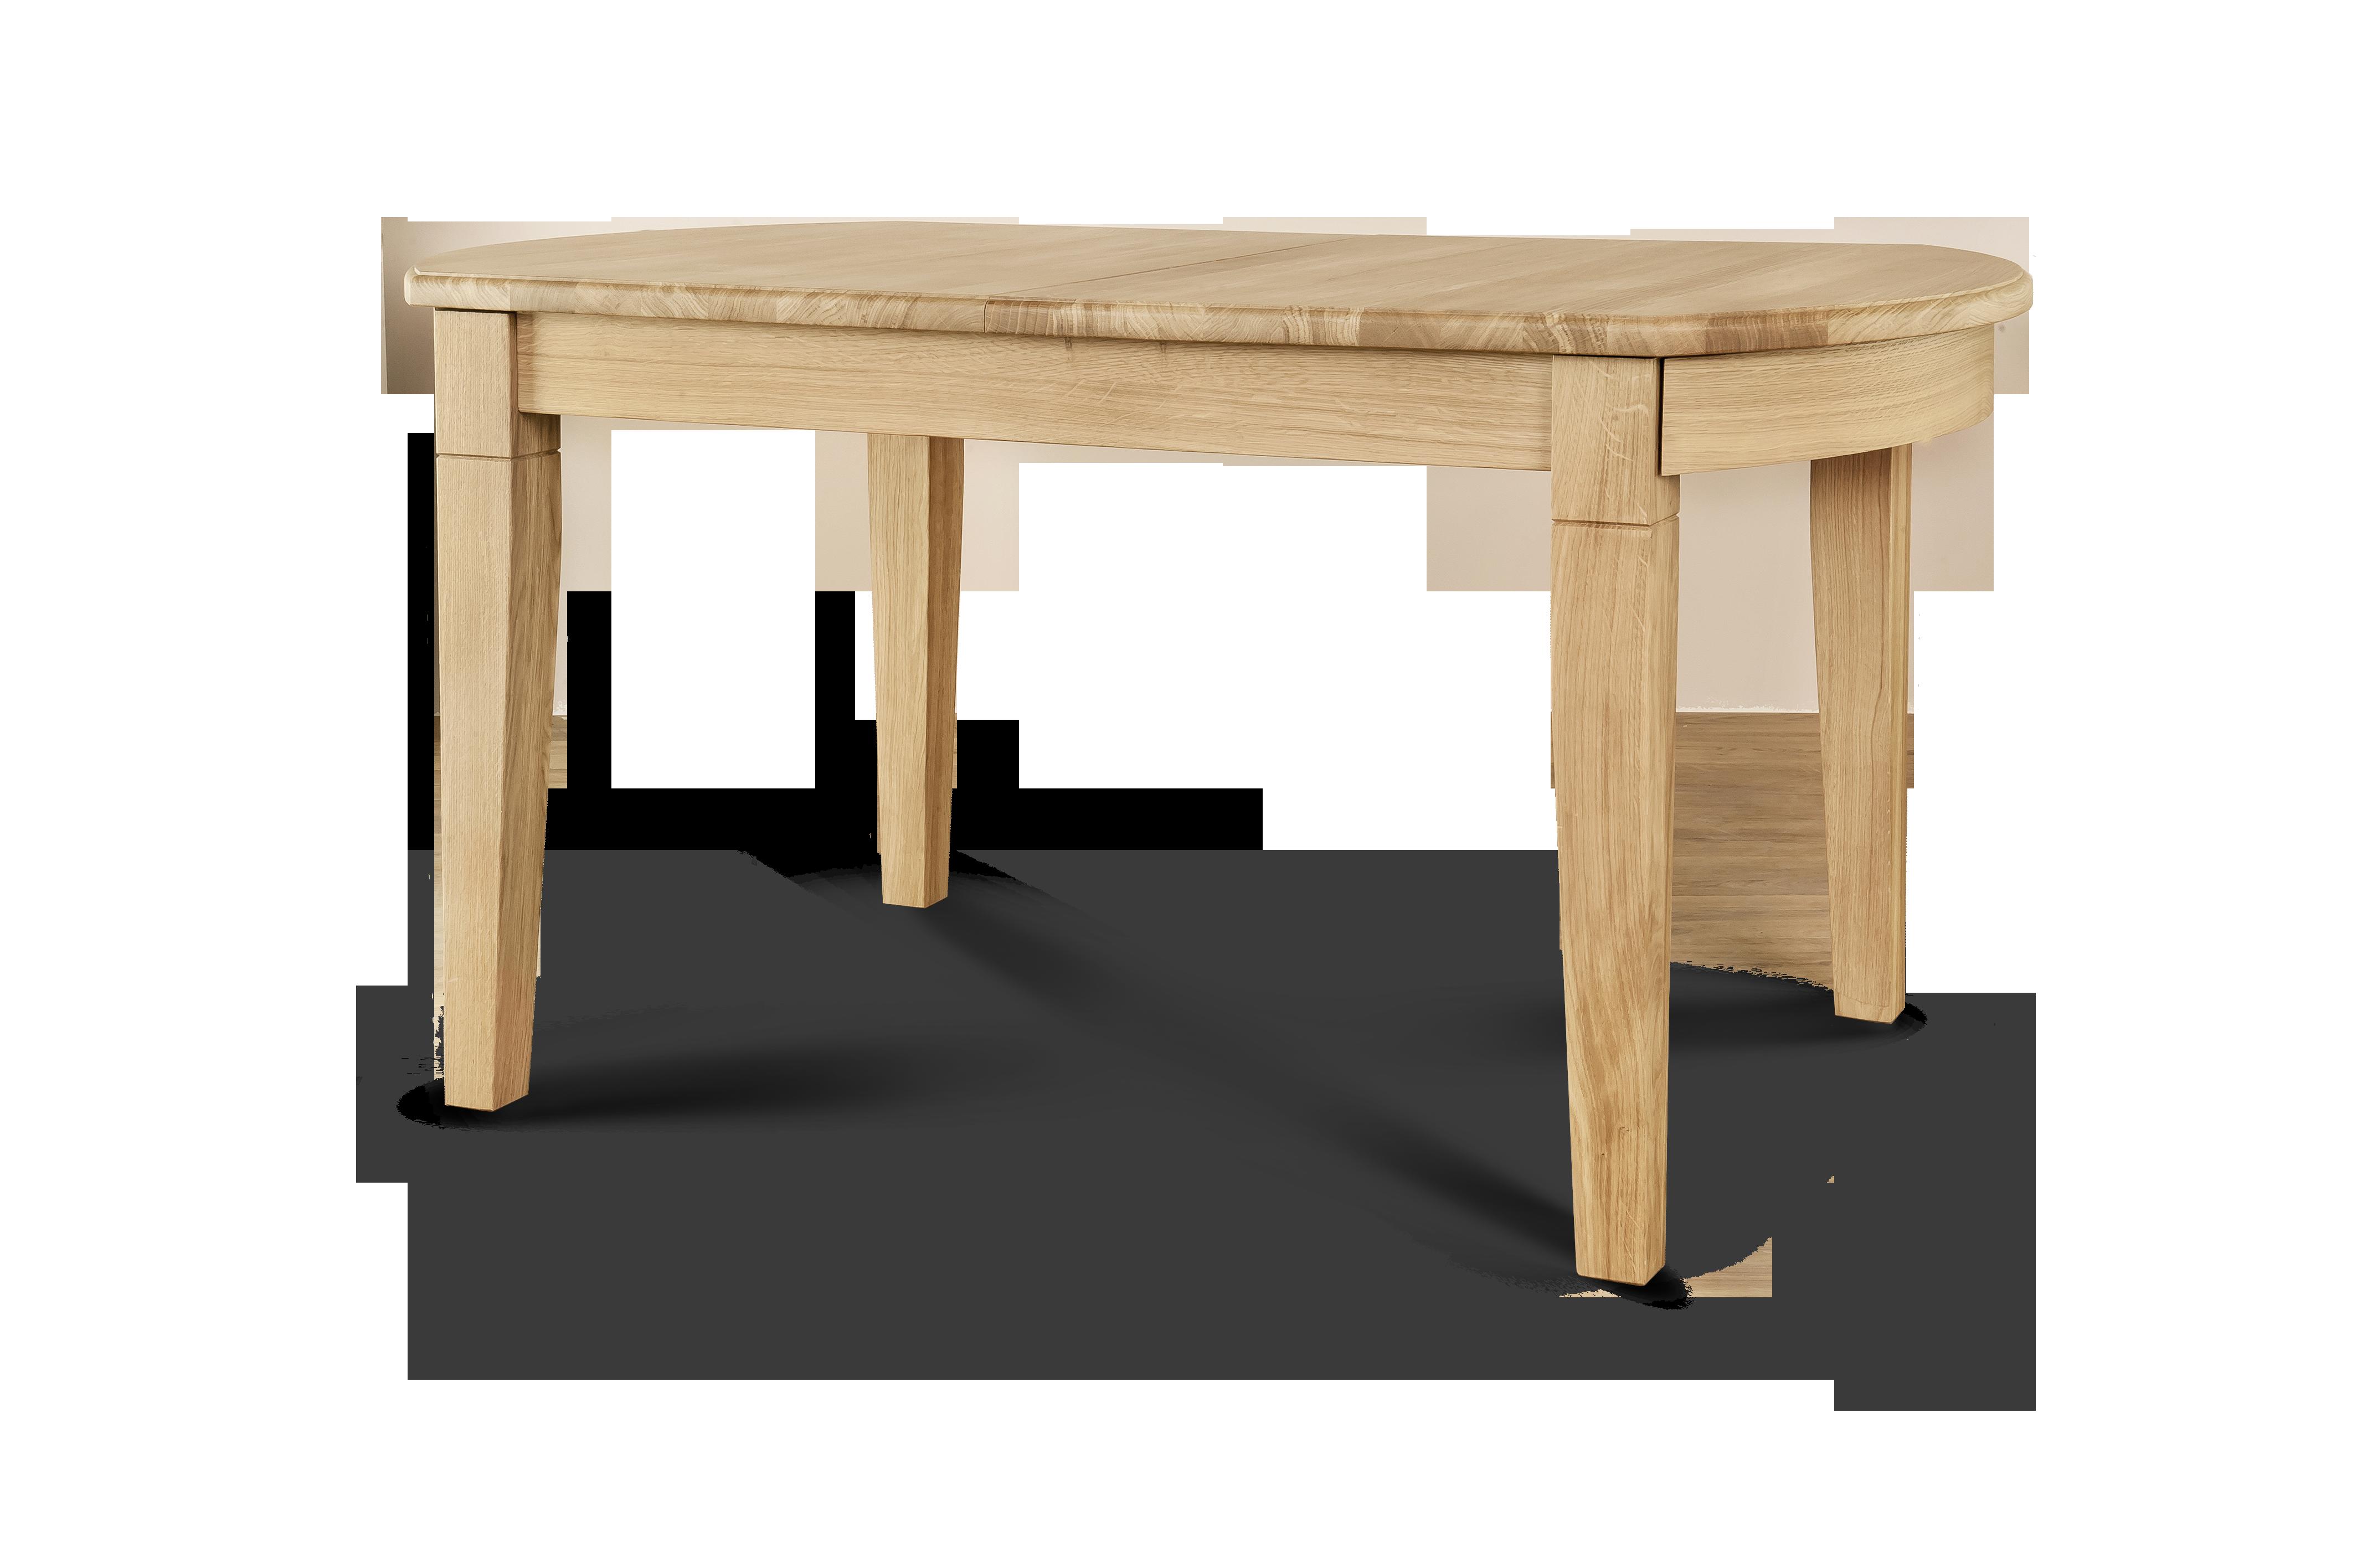 D-end Table H 750 x W 1500 x D 900 (+390 mm leaf) H 750 x W 1800 x D 900 (+500 mm leaf)